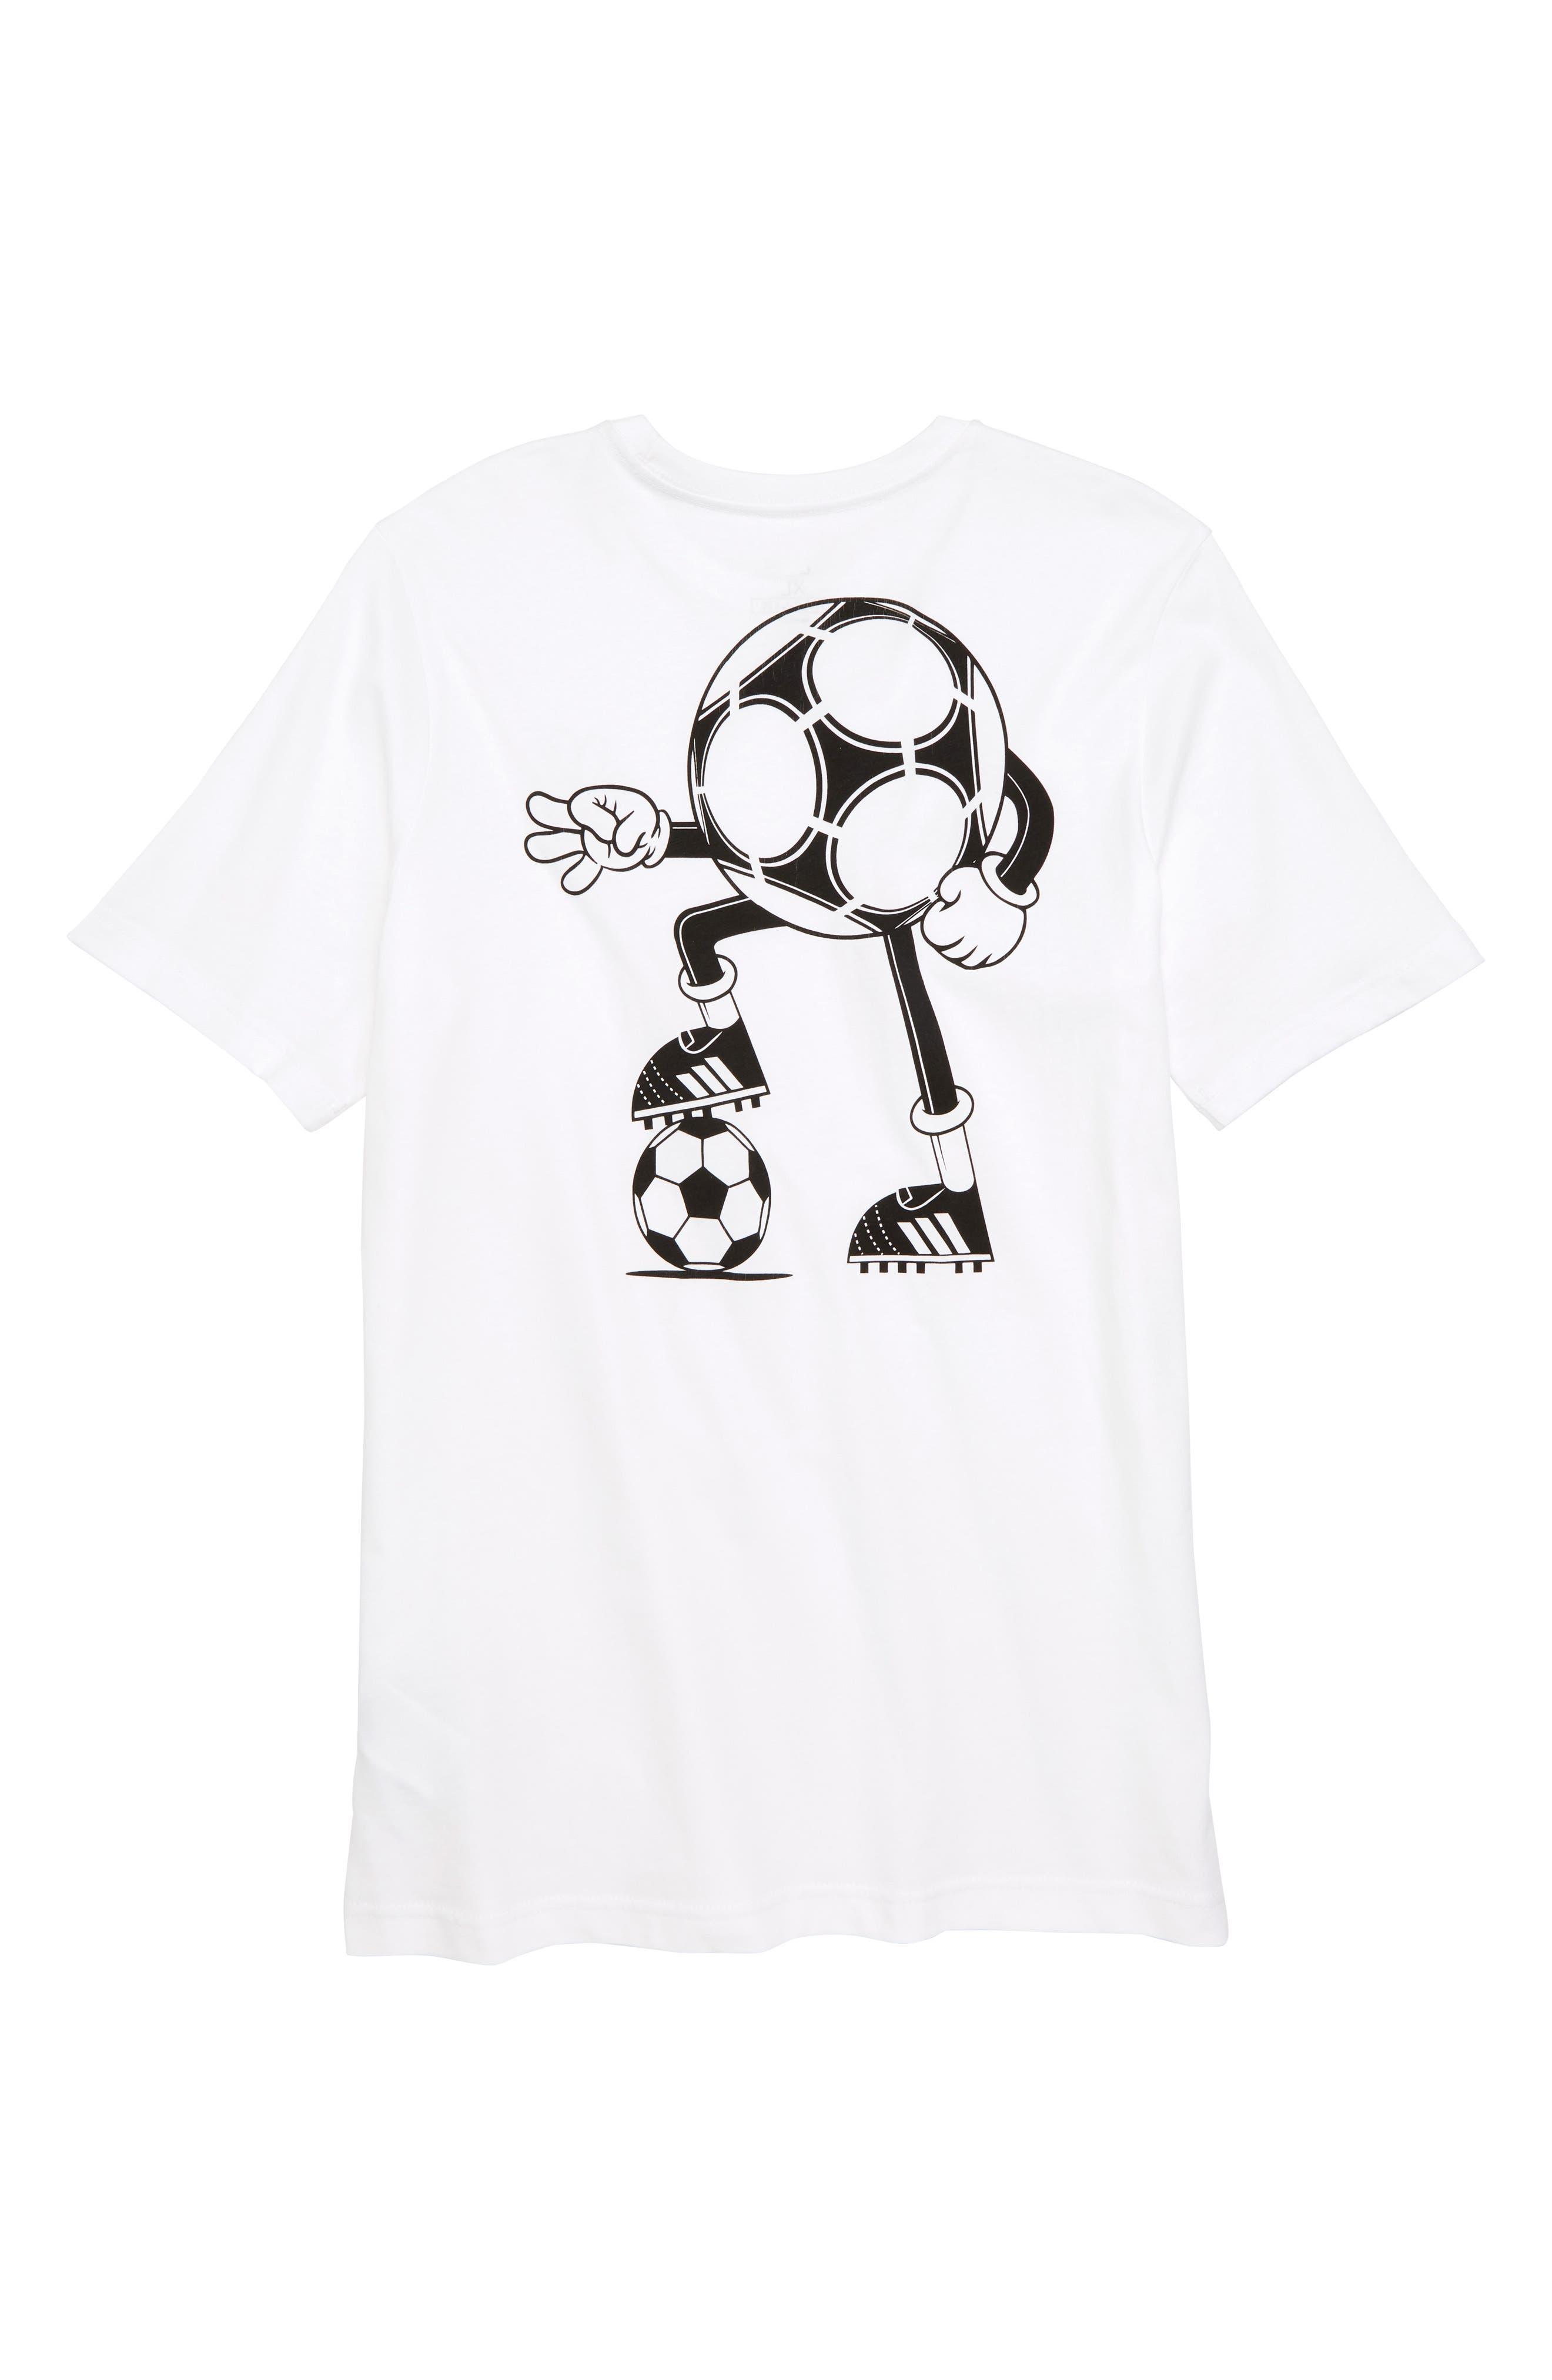 2018 FIFA World Cup Mascot T-Shirt,                             Alternate thumbnail 2, color,                             100